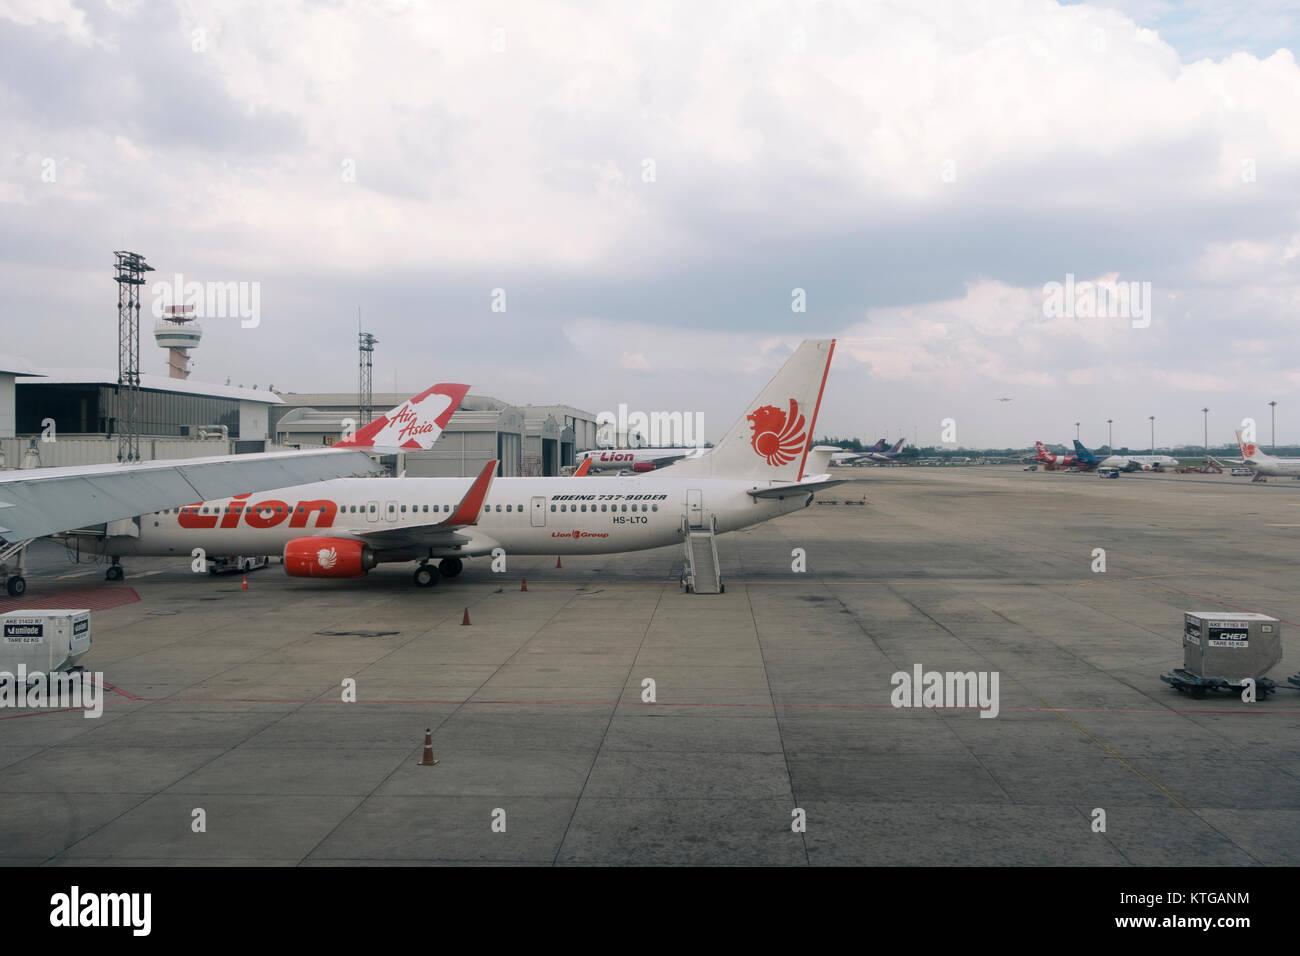 Don Muang Airport Car Parking